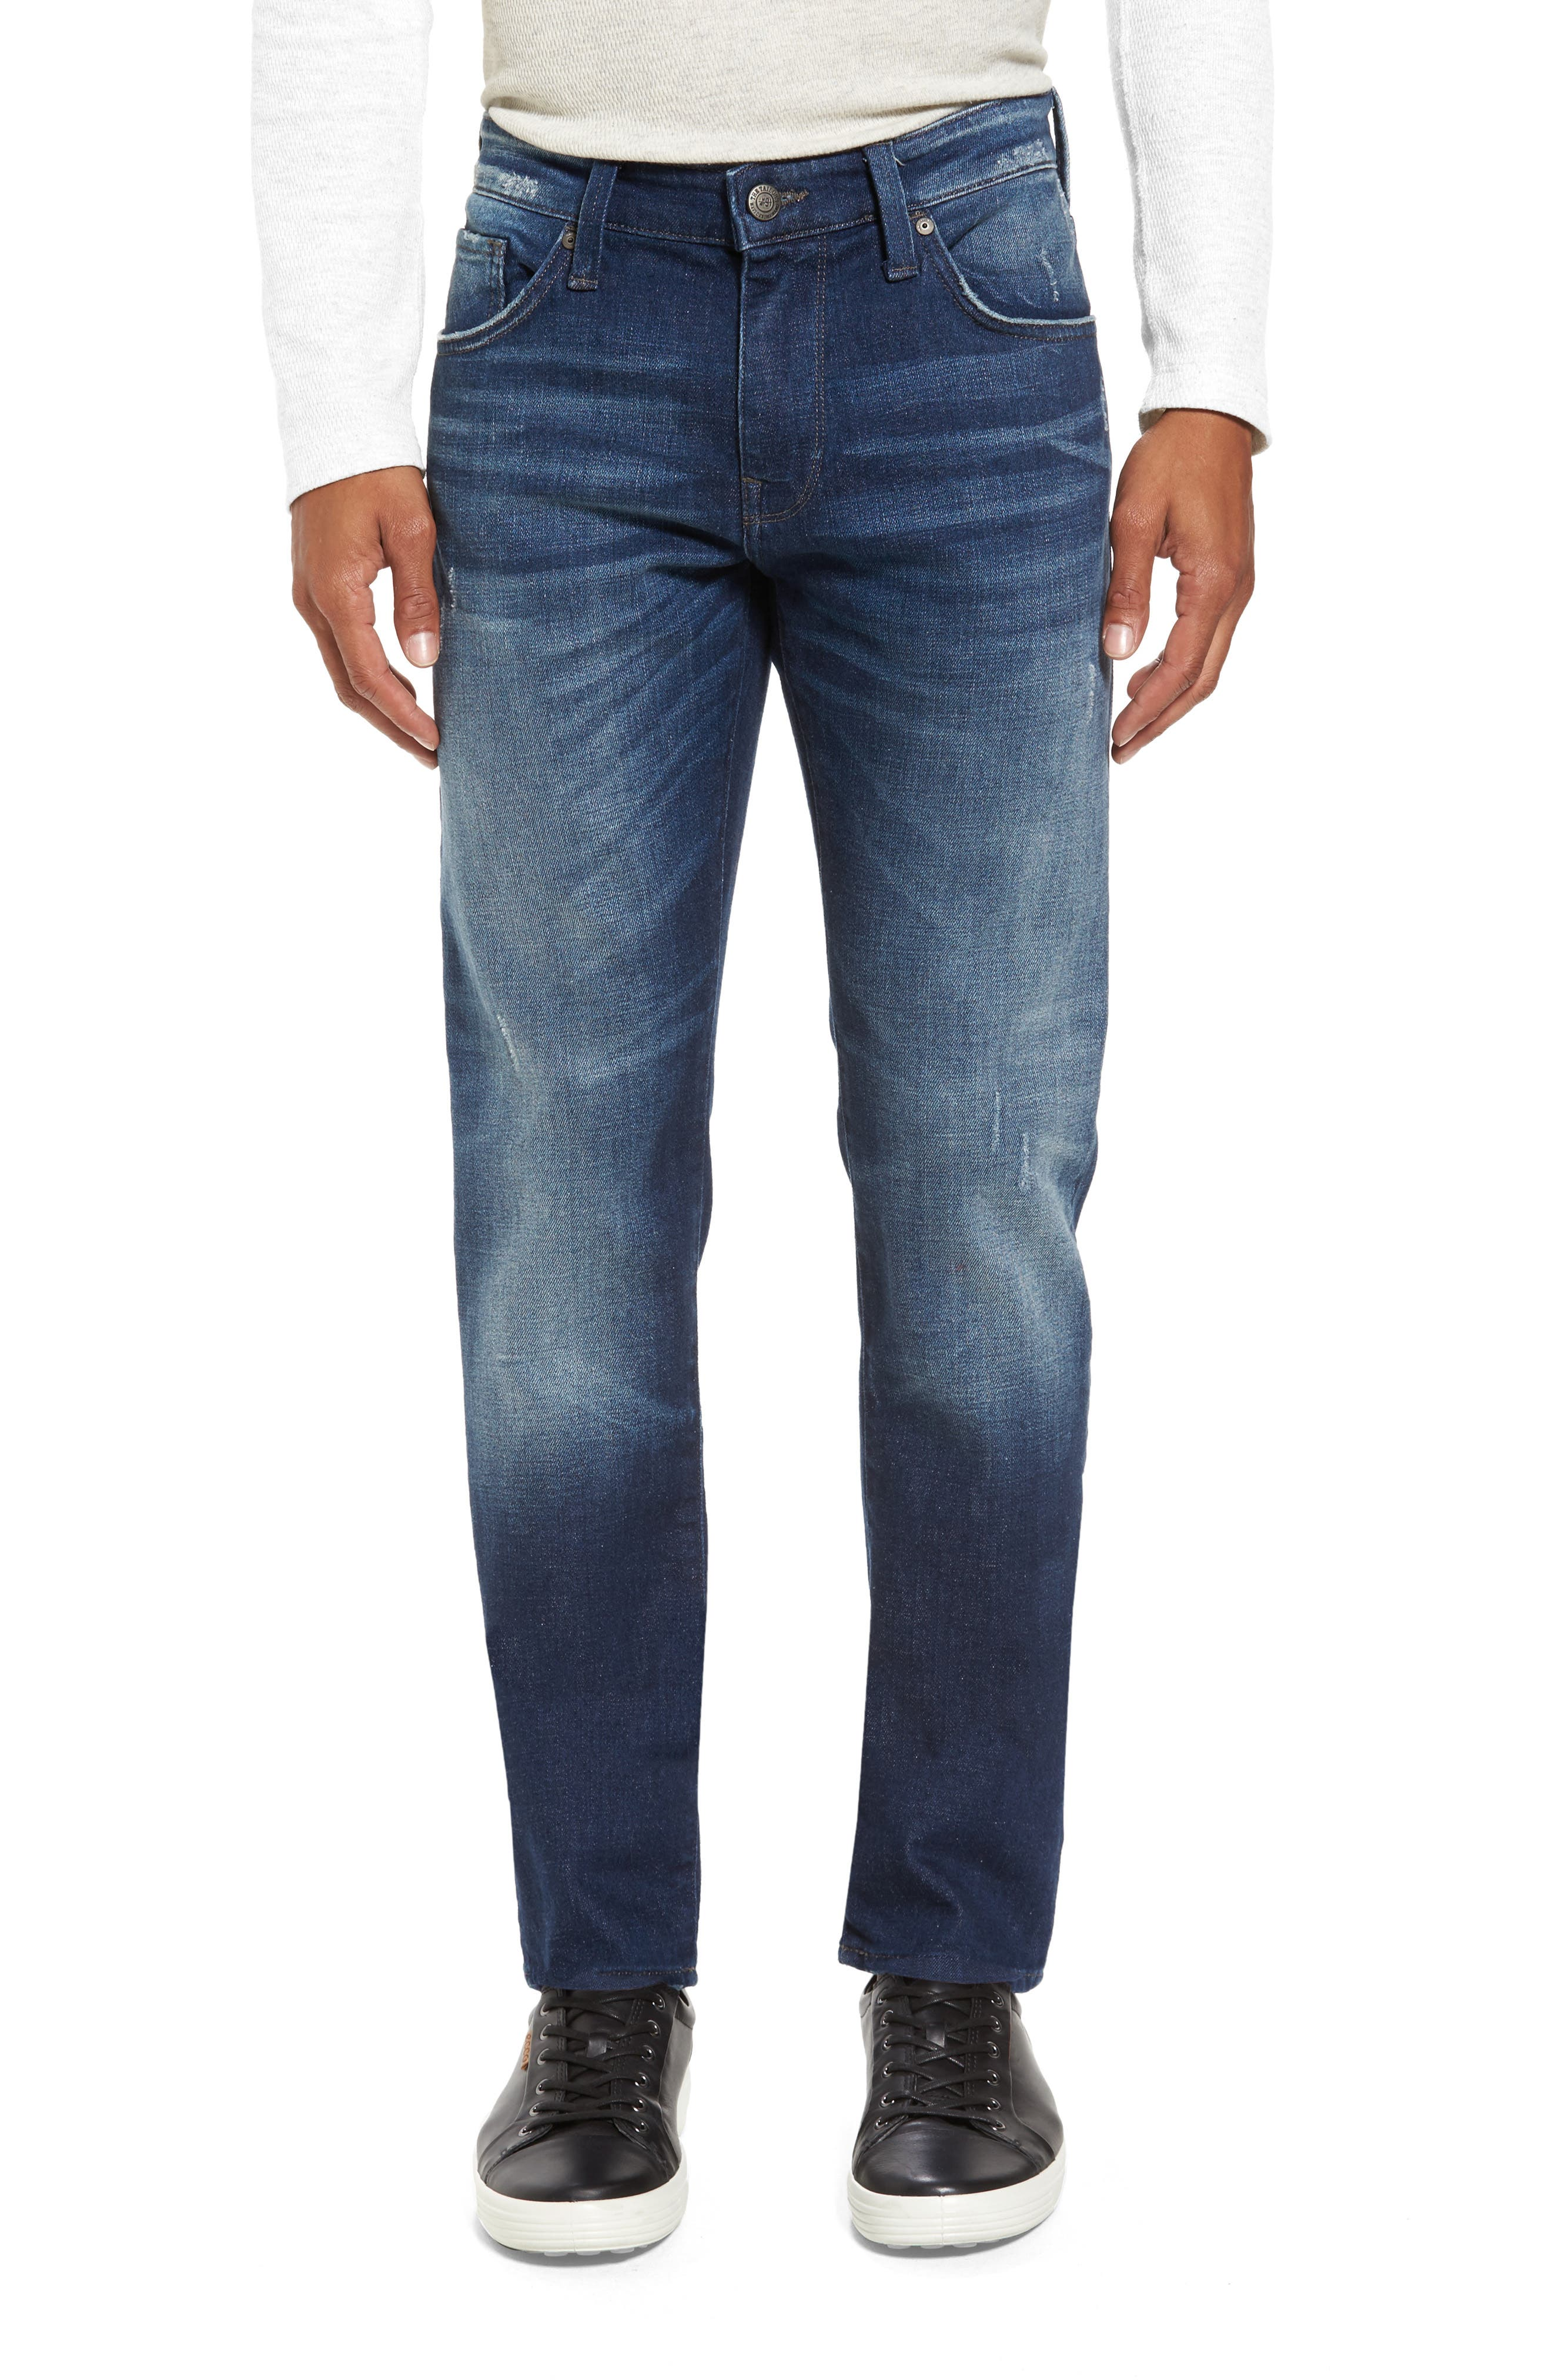 Alternate Image 1 Selected - Mavi Jeans Jake Easy Slim Fit Jeans (Dark Brooklyn)